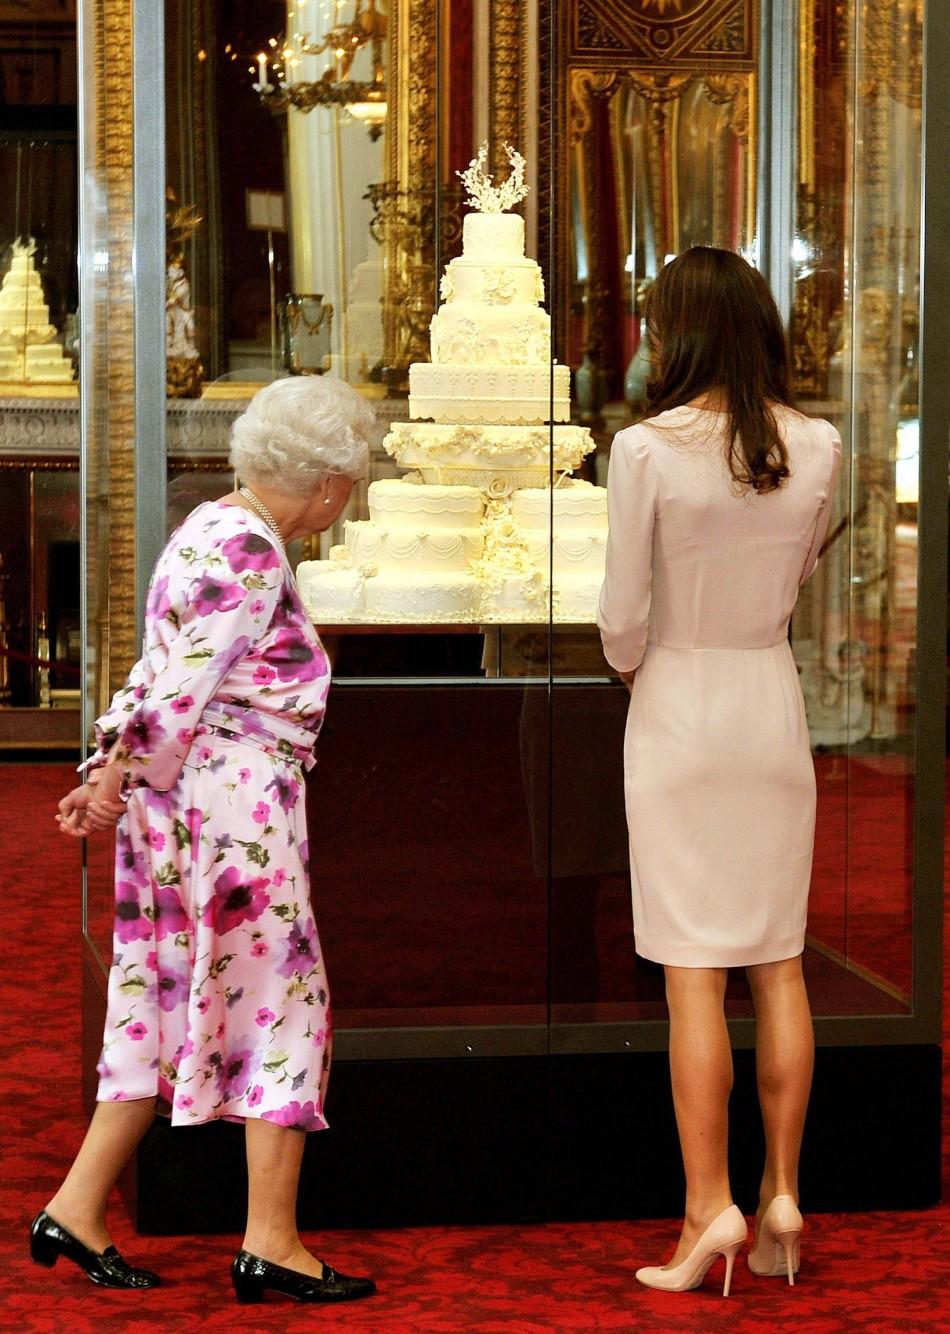 Britain039s Queen Elizabeth and Catherine, the Duchess of Cambridge,